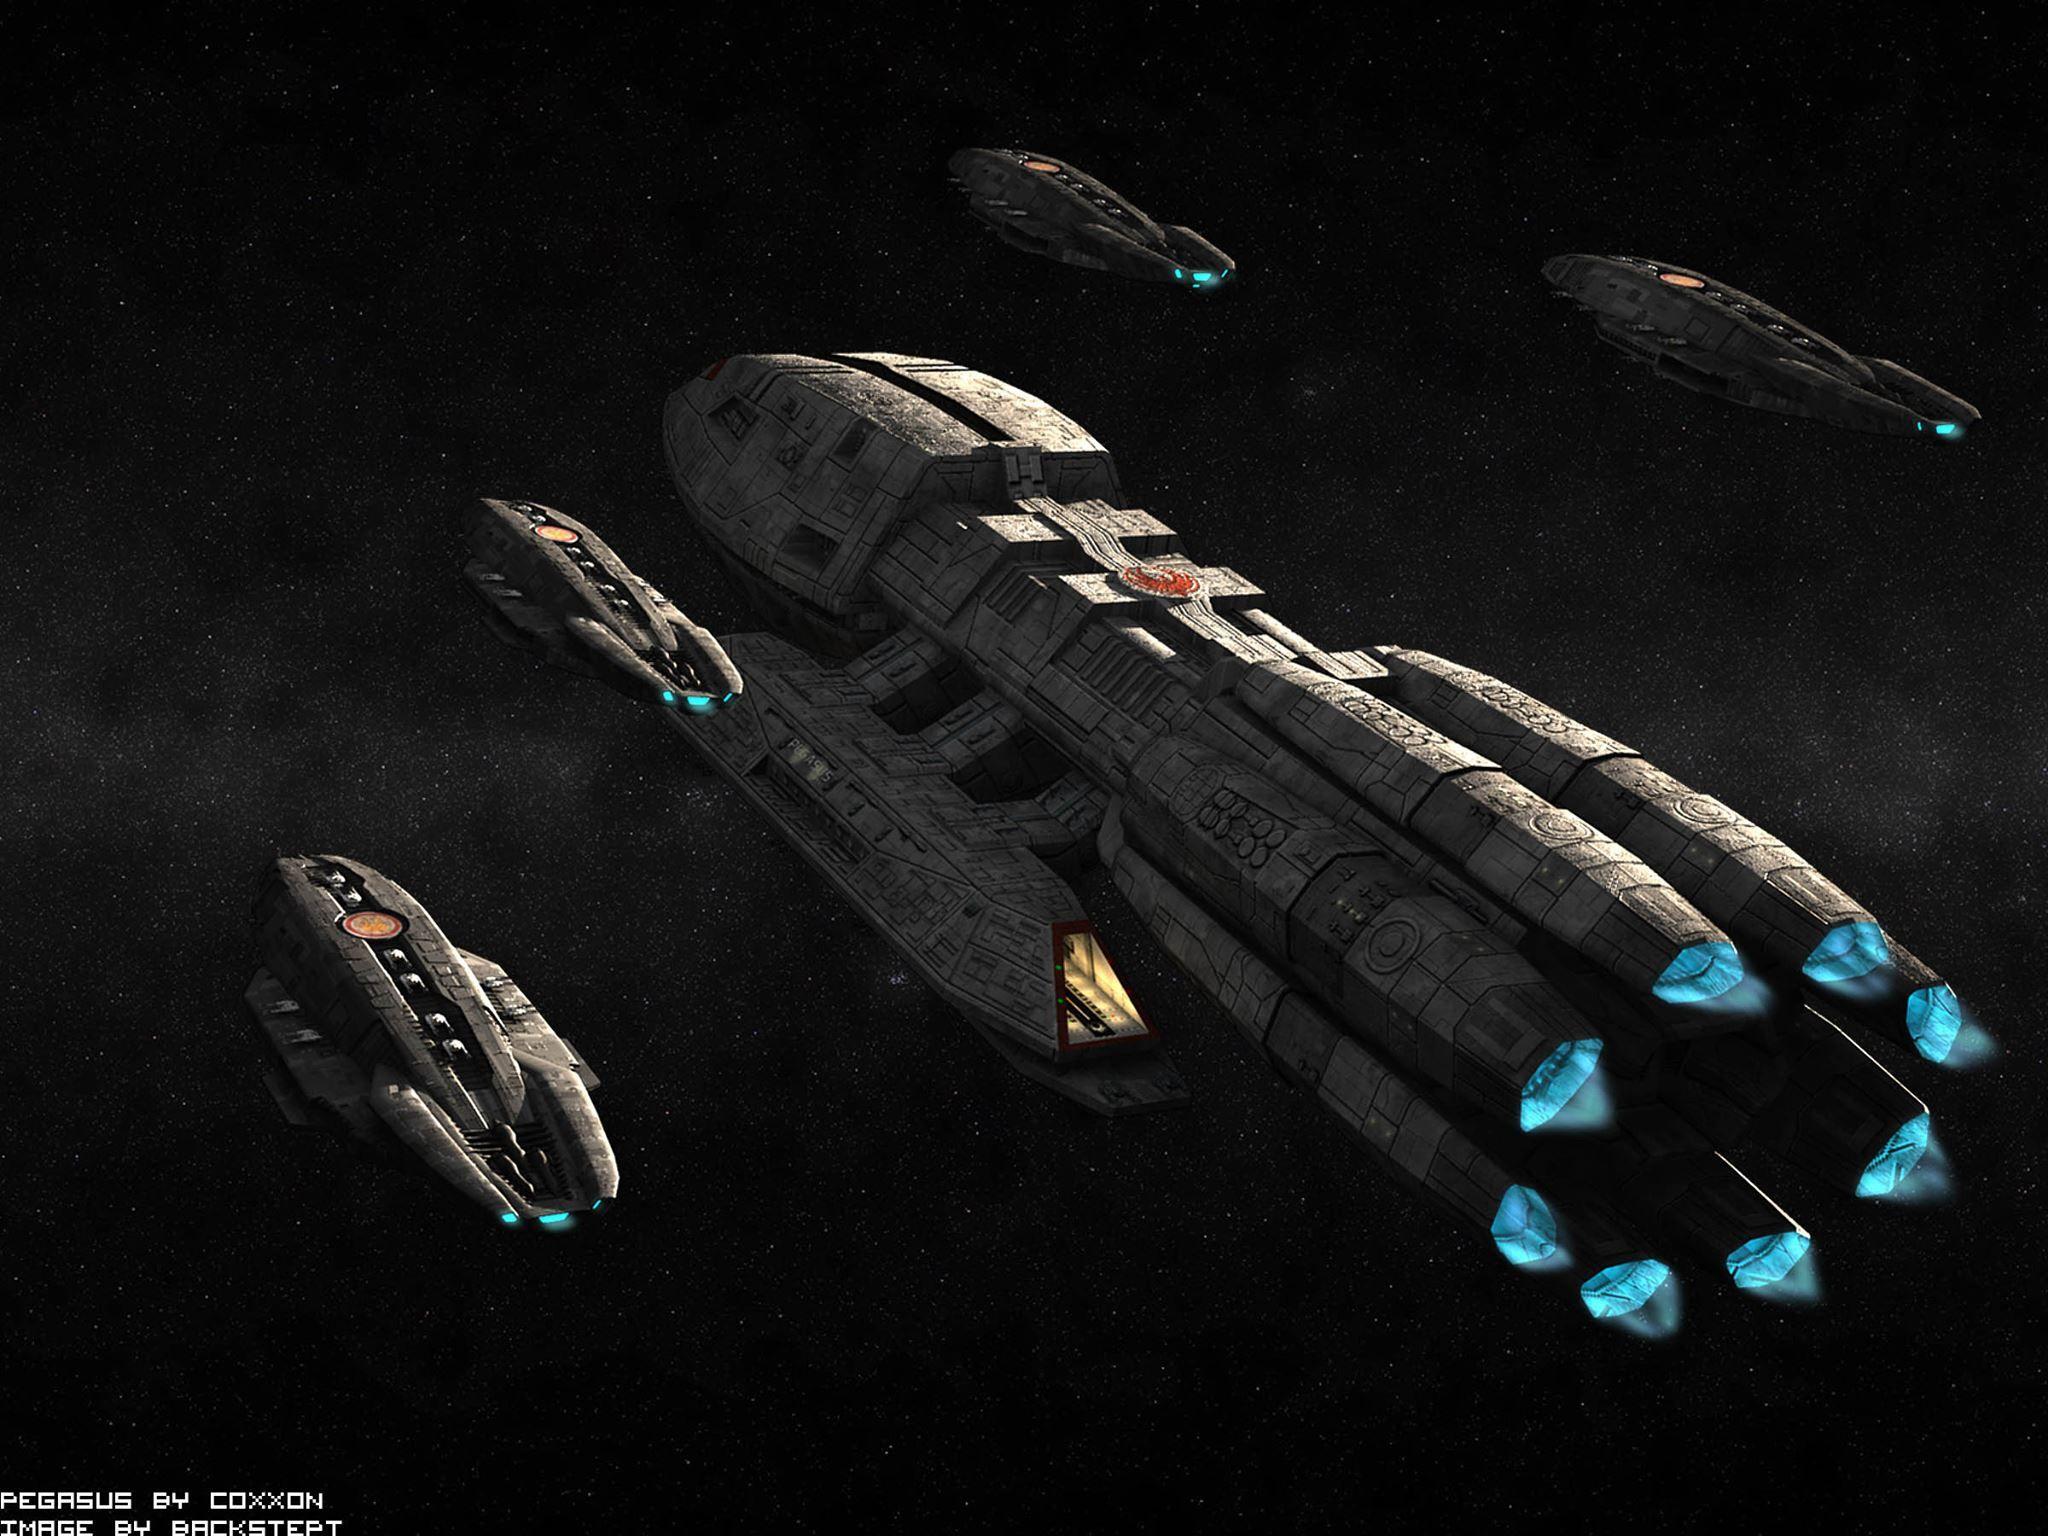 Botanical Cruiser Battlestar Galactica Spacecraft Kiln Dry ...  |Battlestar Galactica Spacecraft